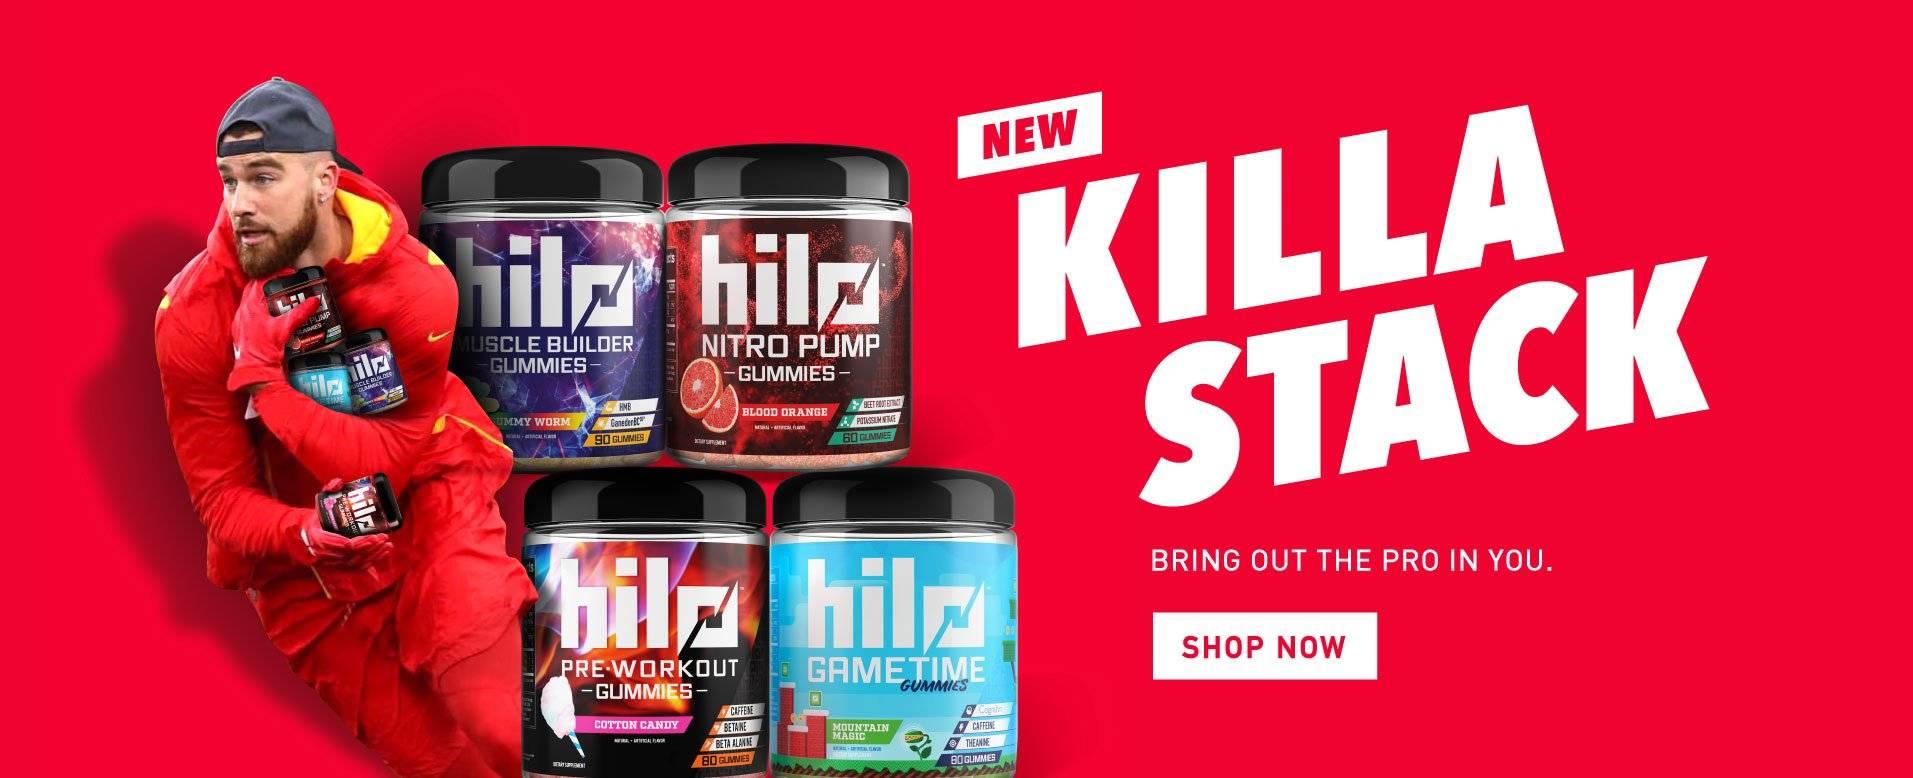 Hilo Gummies Killa Stack Travis Kelce Shop Now